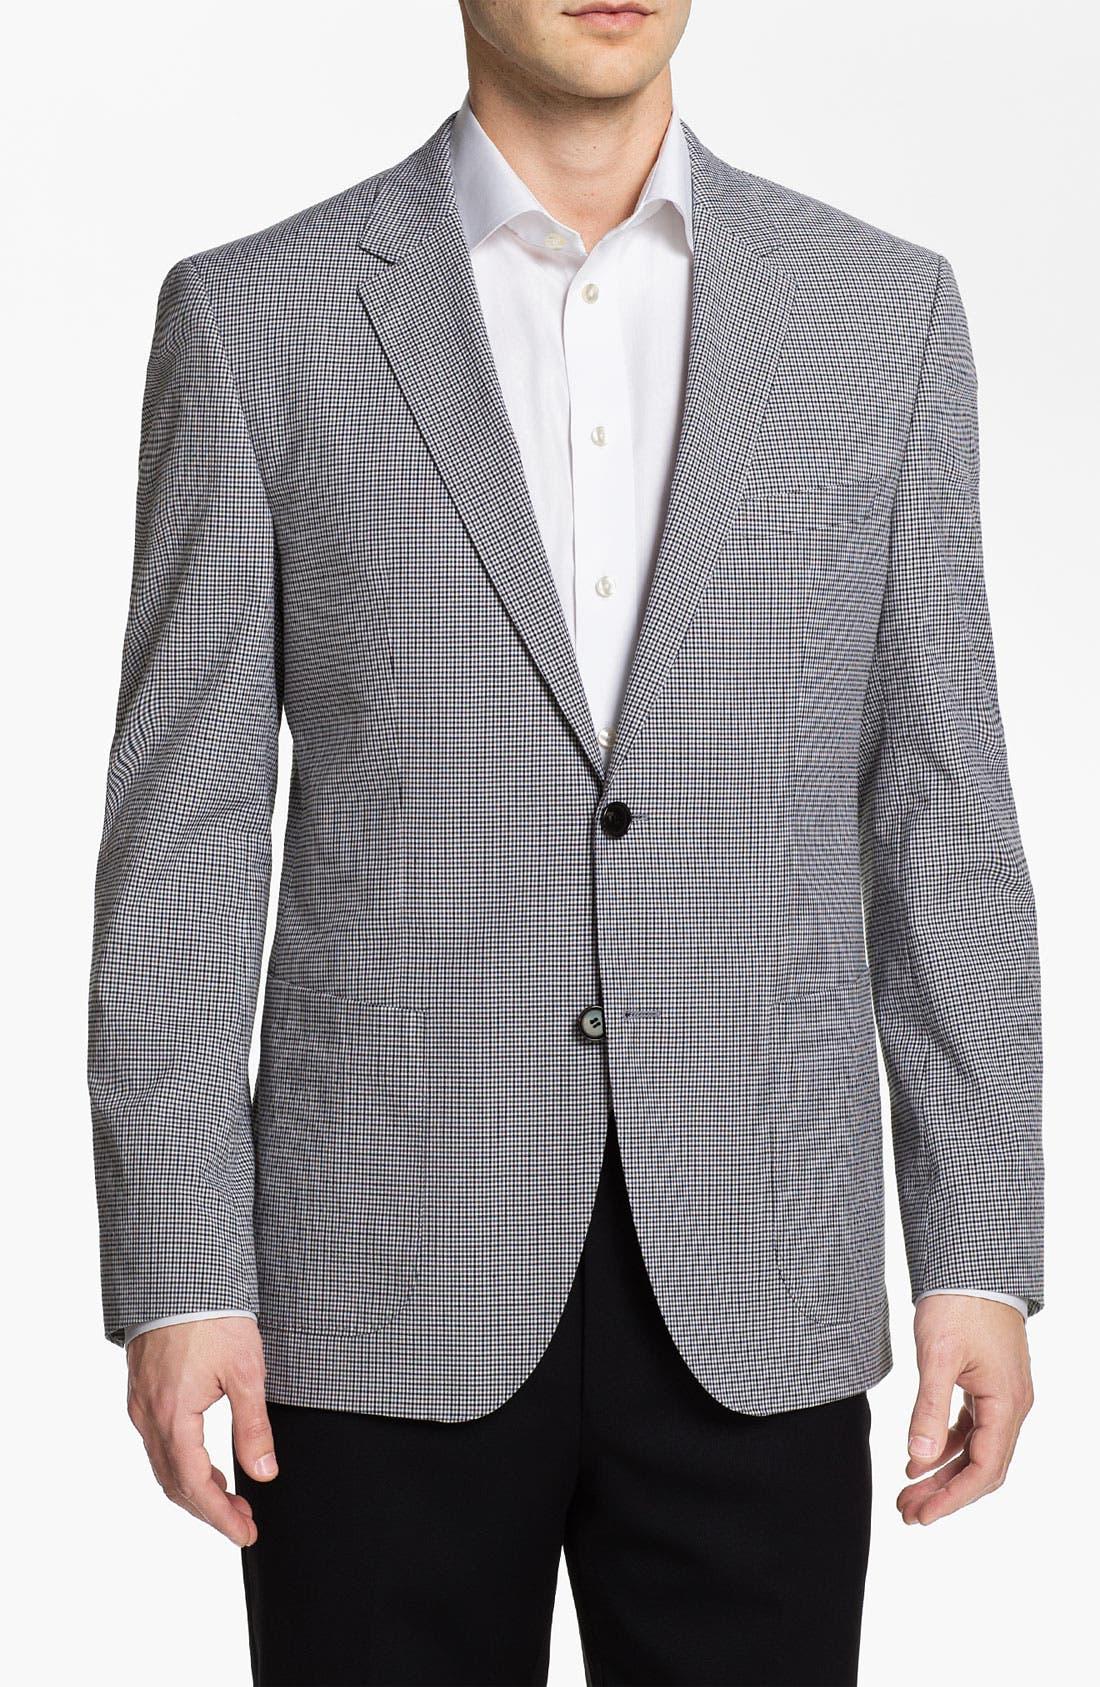 Main Image - BOSS HUGO BOSS 'Jesse' Trim Fit Sportcoat